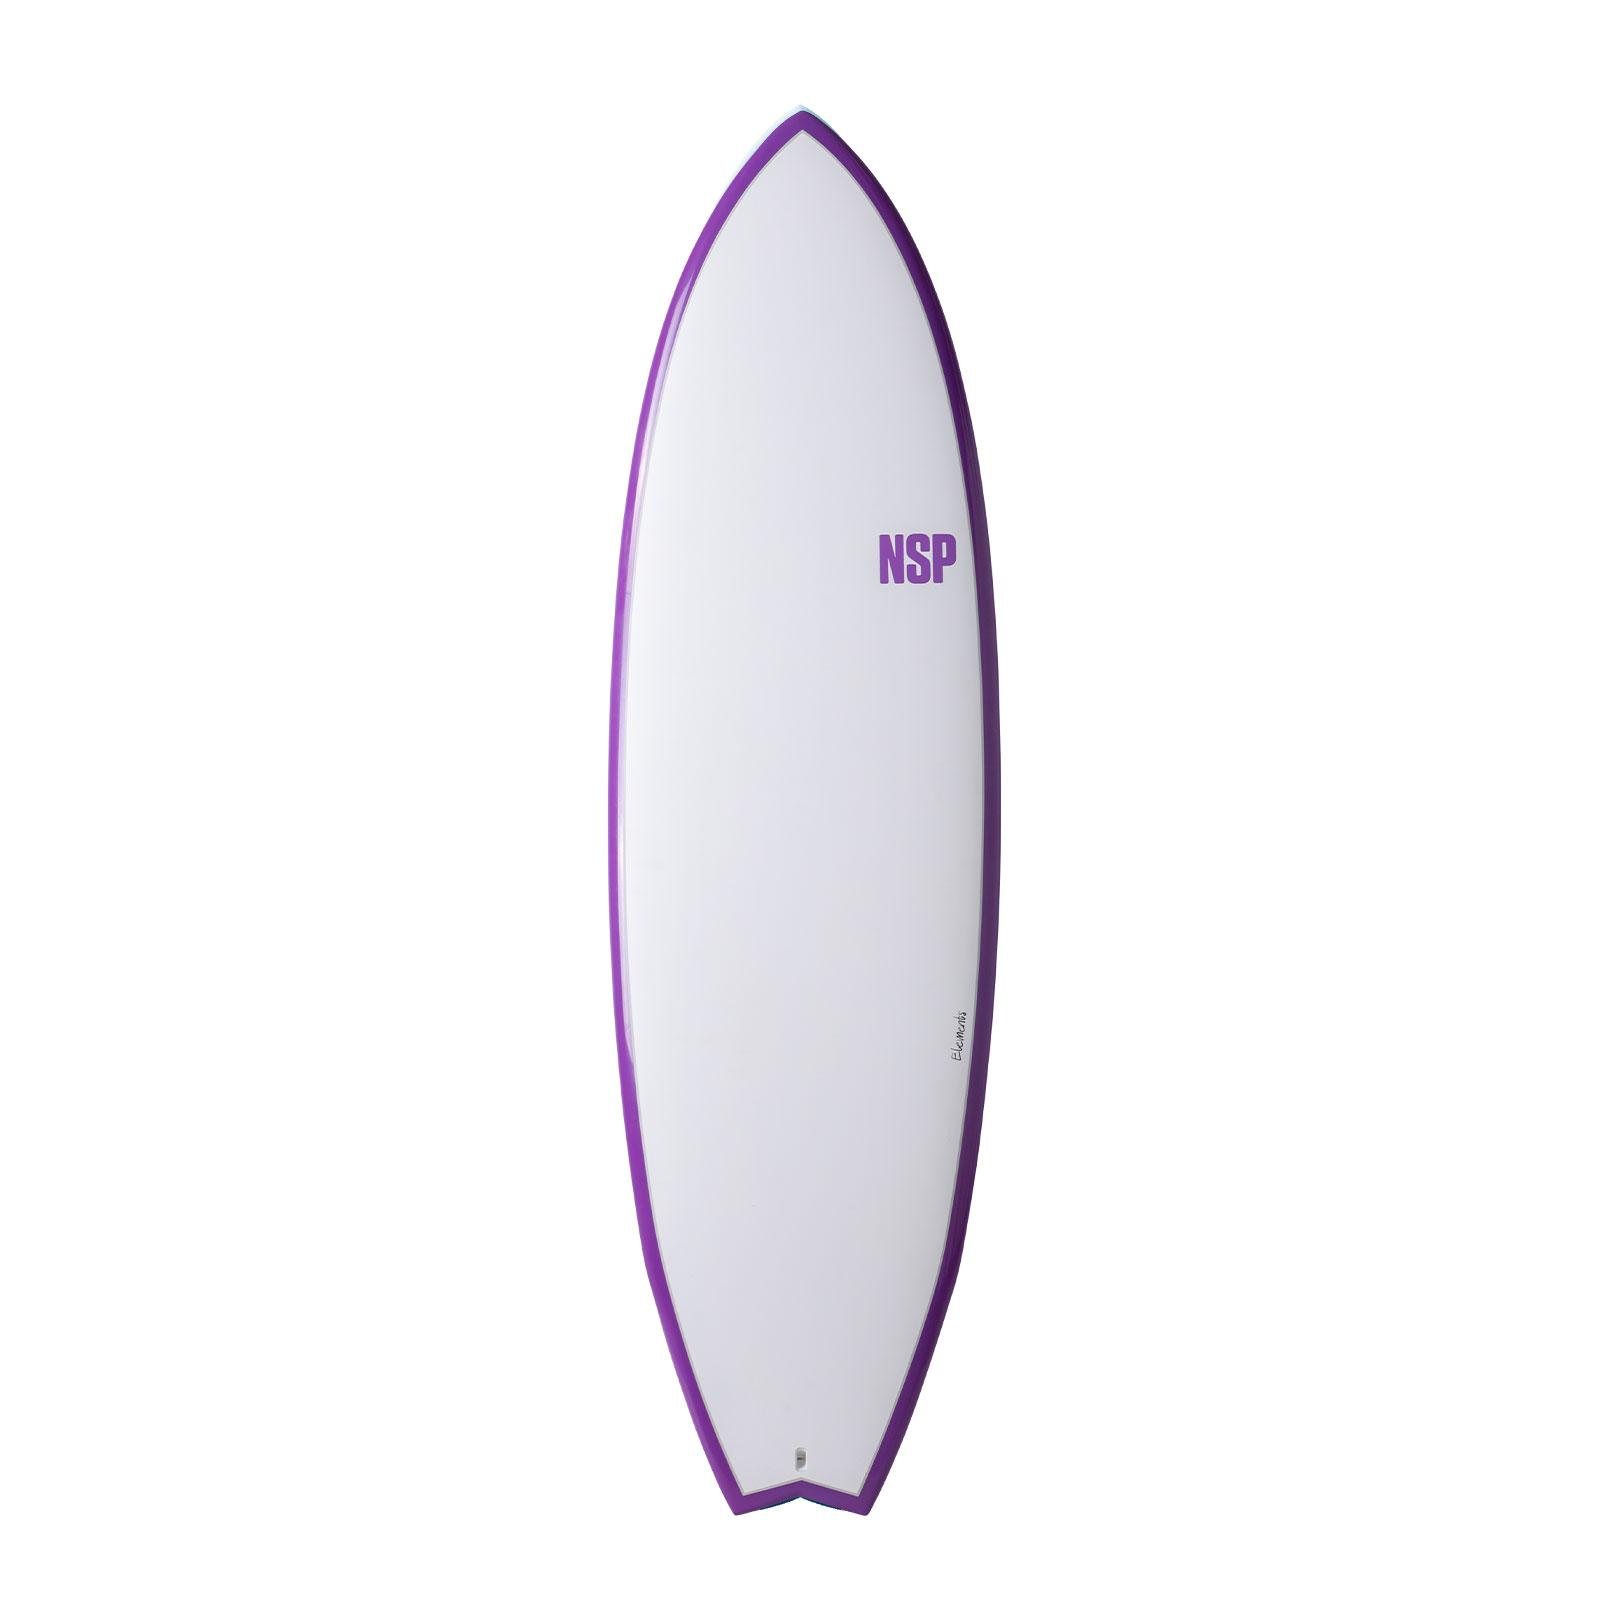 nsp elements fish surfboard